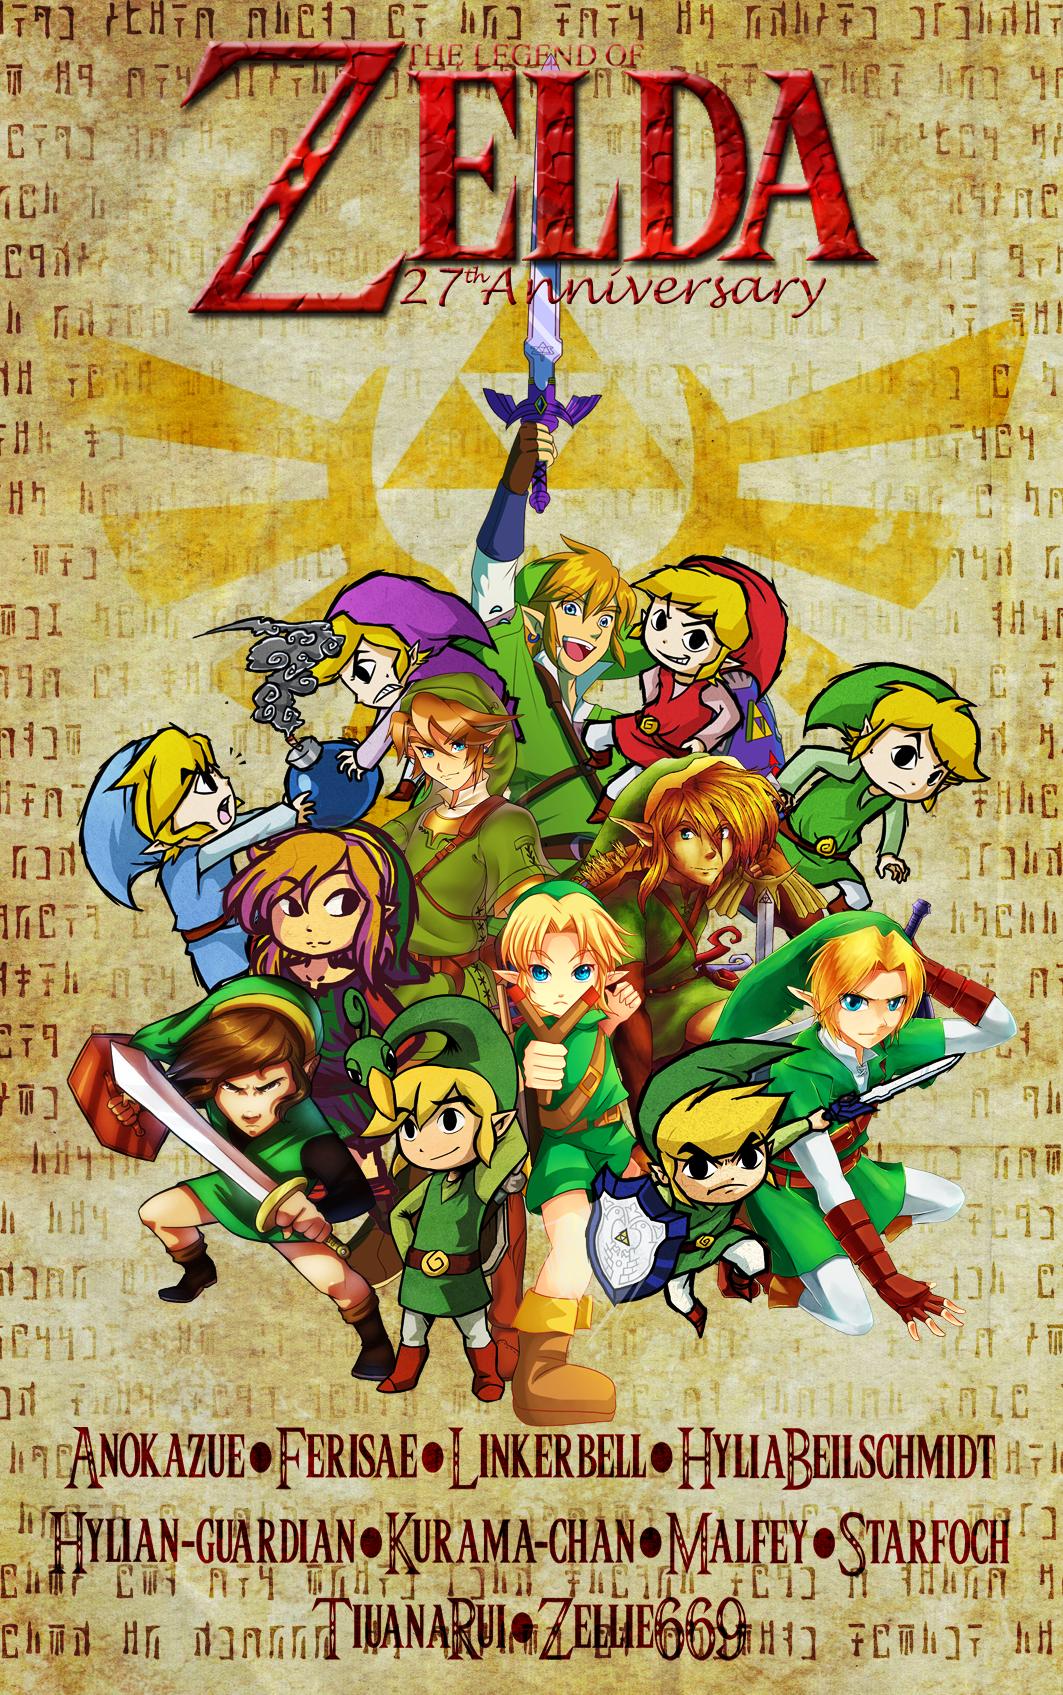 The Legend of Zelda 27th Anniversary Collab by HyliaBeilschmidt